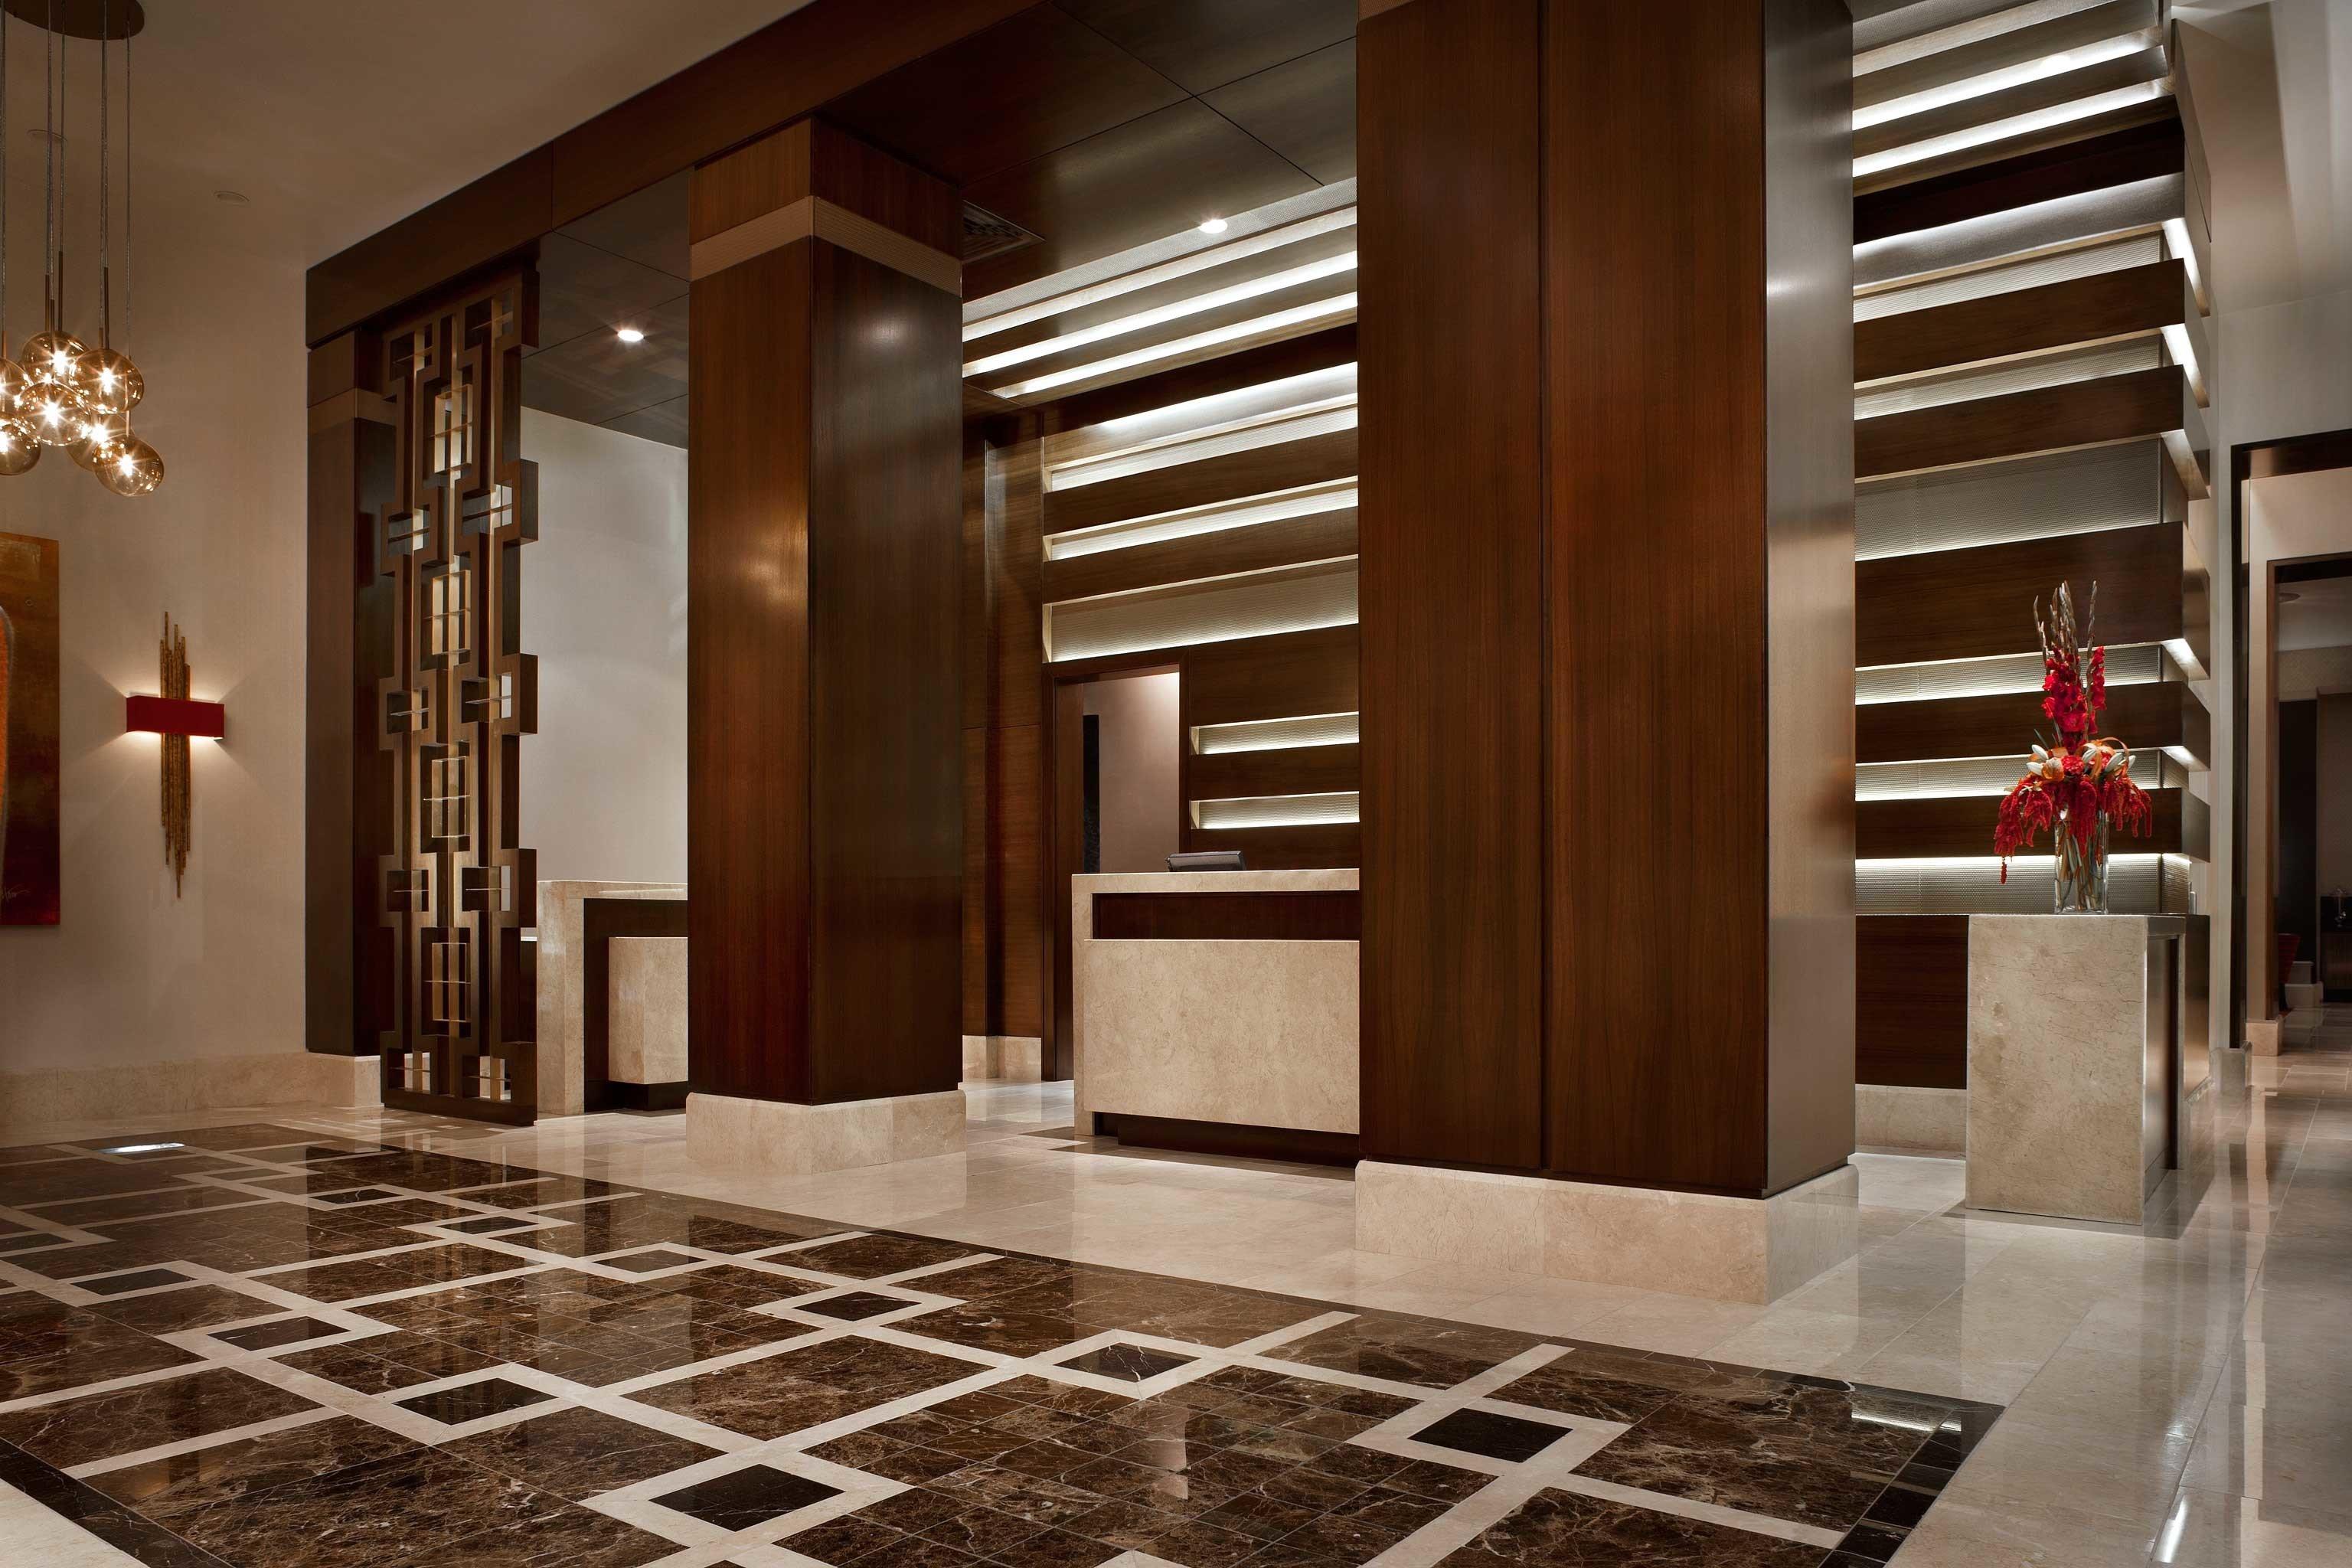 Lobby building hardwood flooring wood flooring hall living room cabinetry